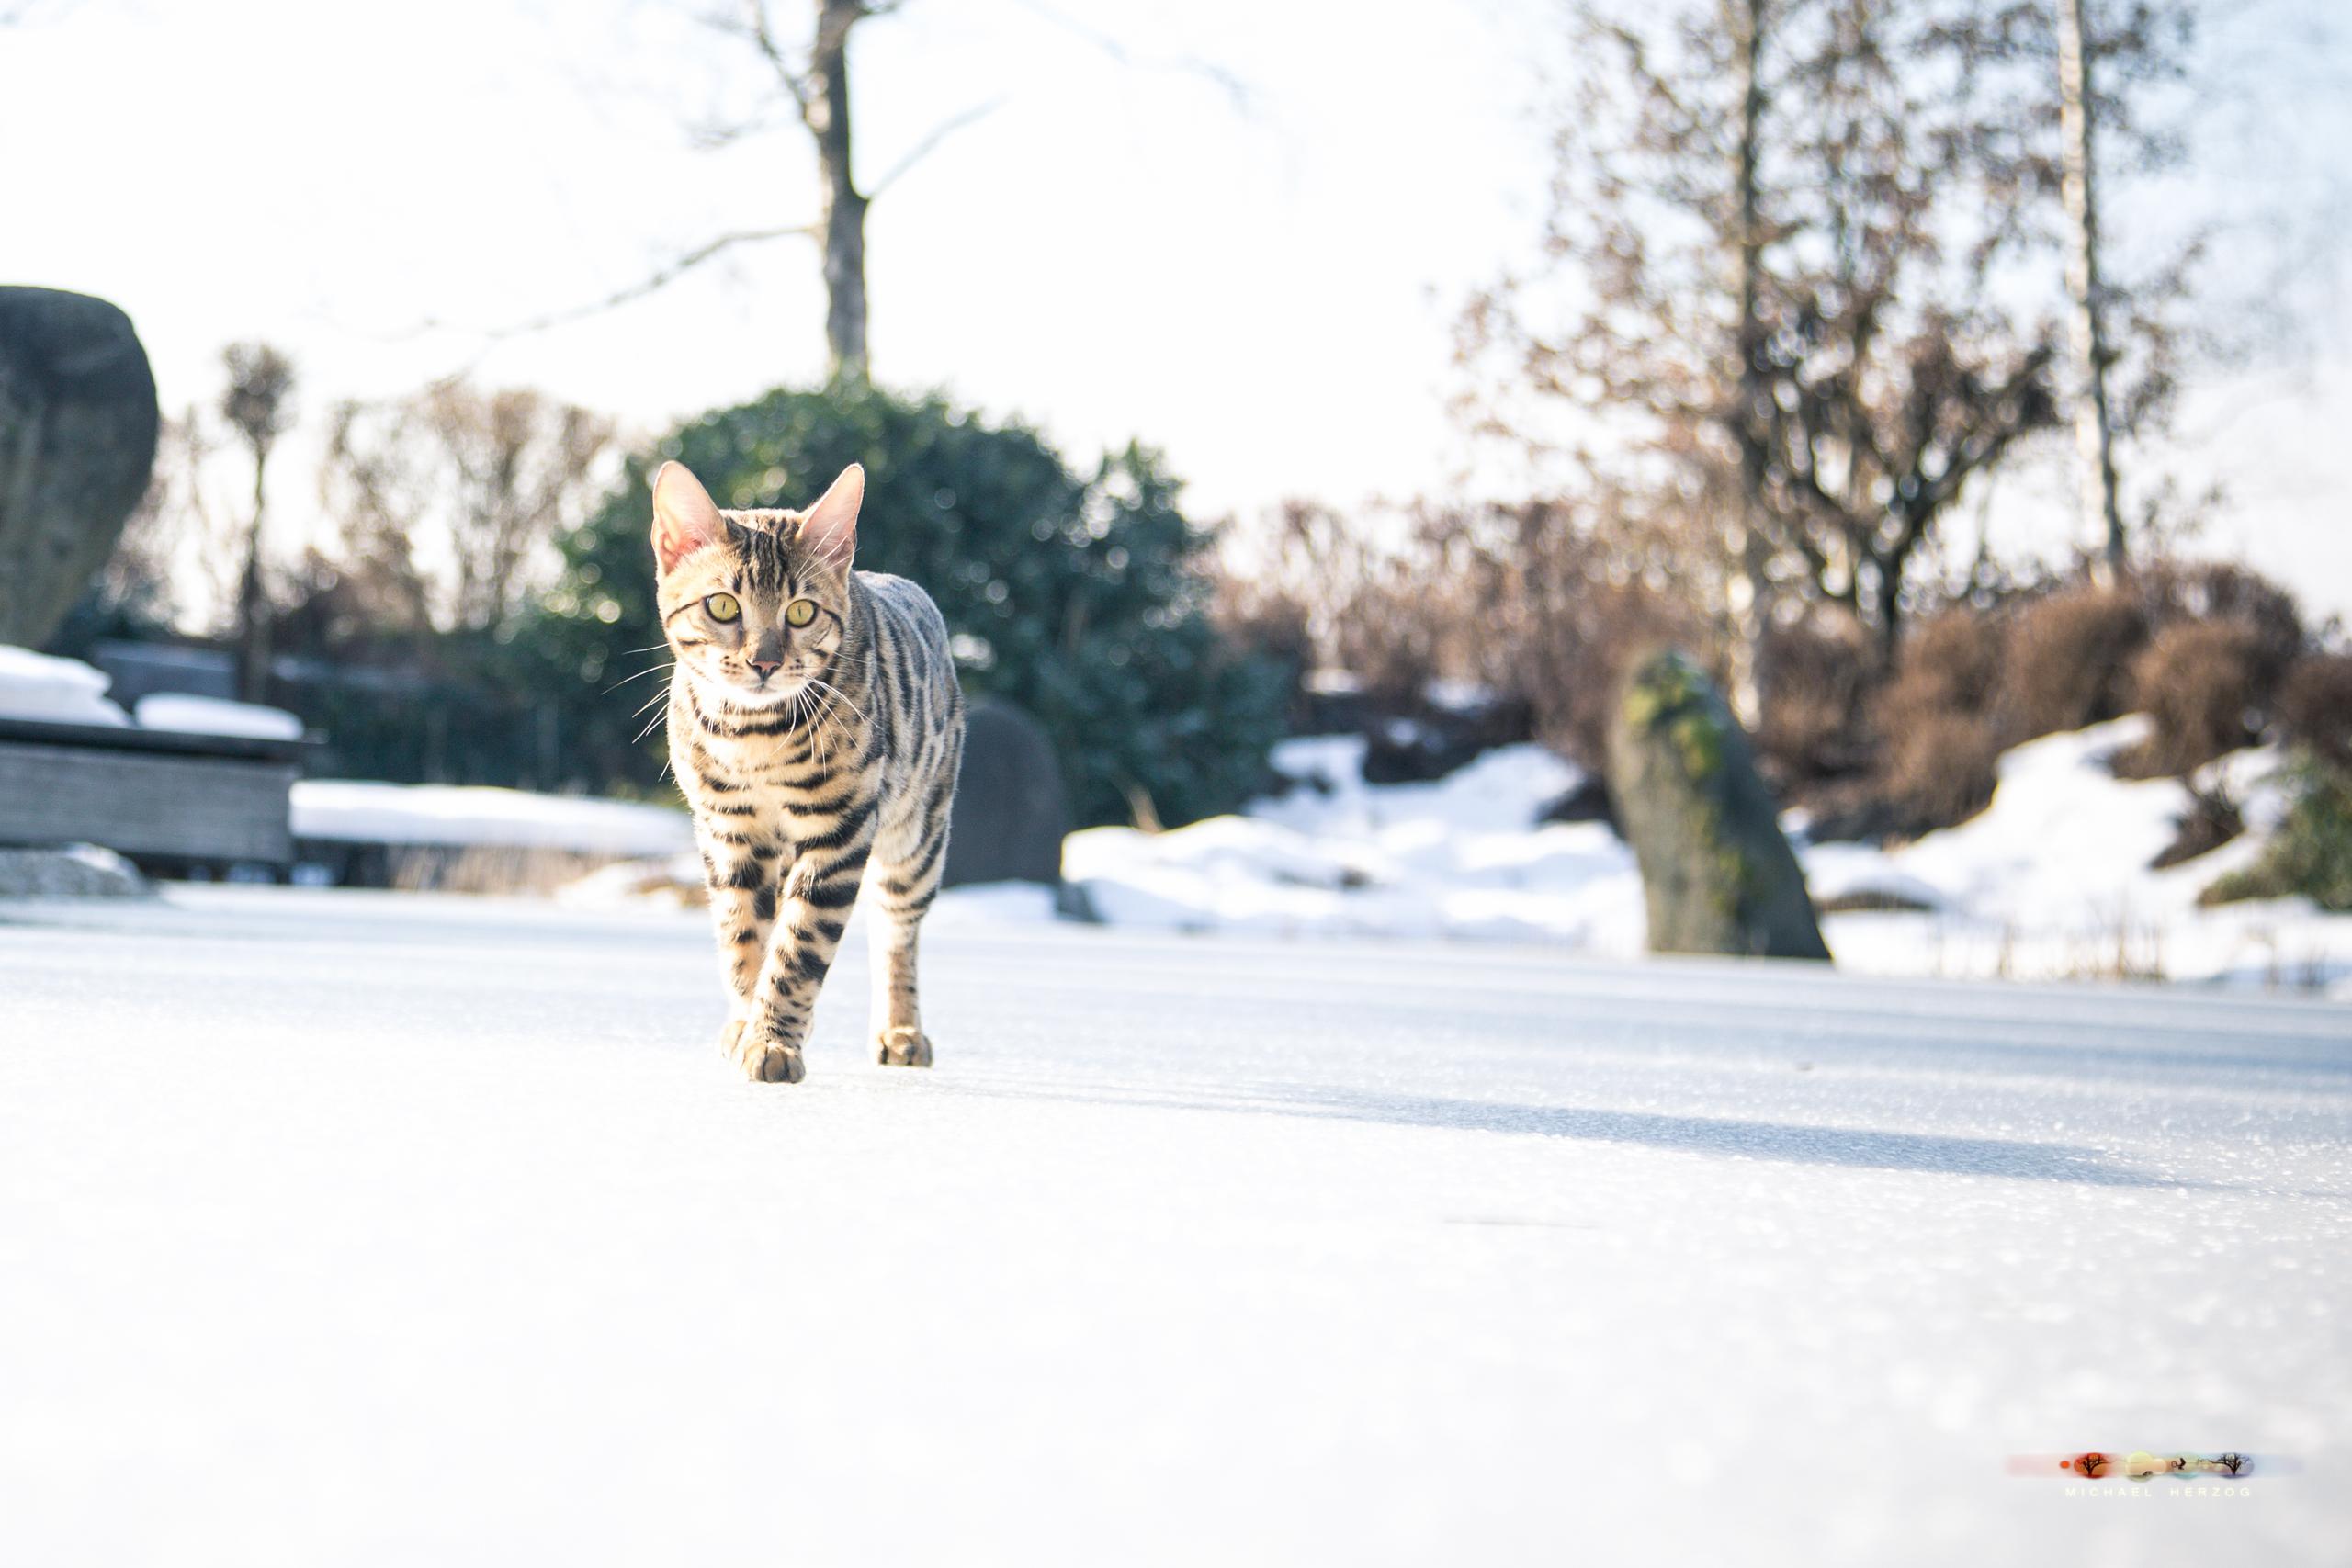 BALUARI_Winter2019_Garten_MichaelHerzog-8952.jpg